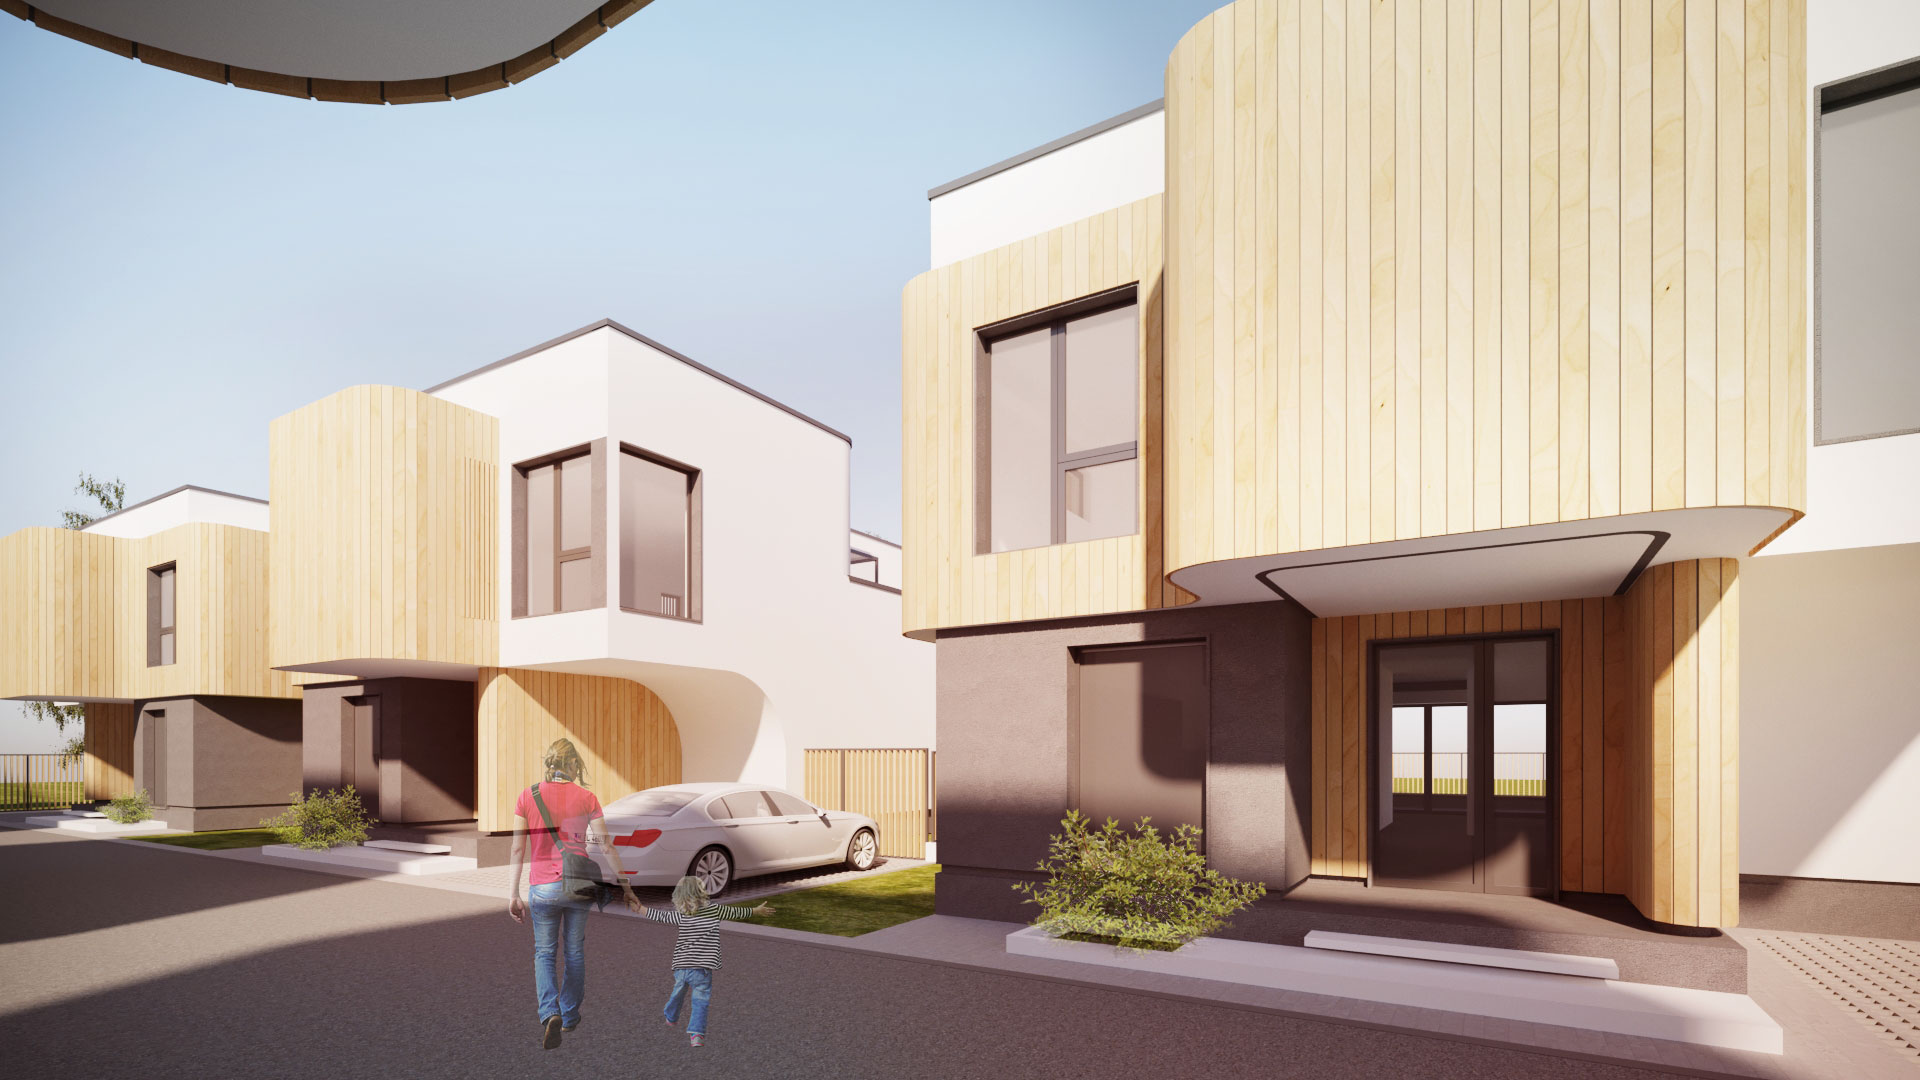 https://nbc-arhitect.ro/wp-content/uploads/2020/10/NBC-Arhitect-_-residential-_-Grand-Home-Residence-_-Romania_2.jpg